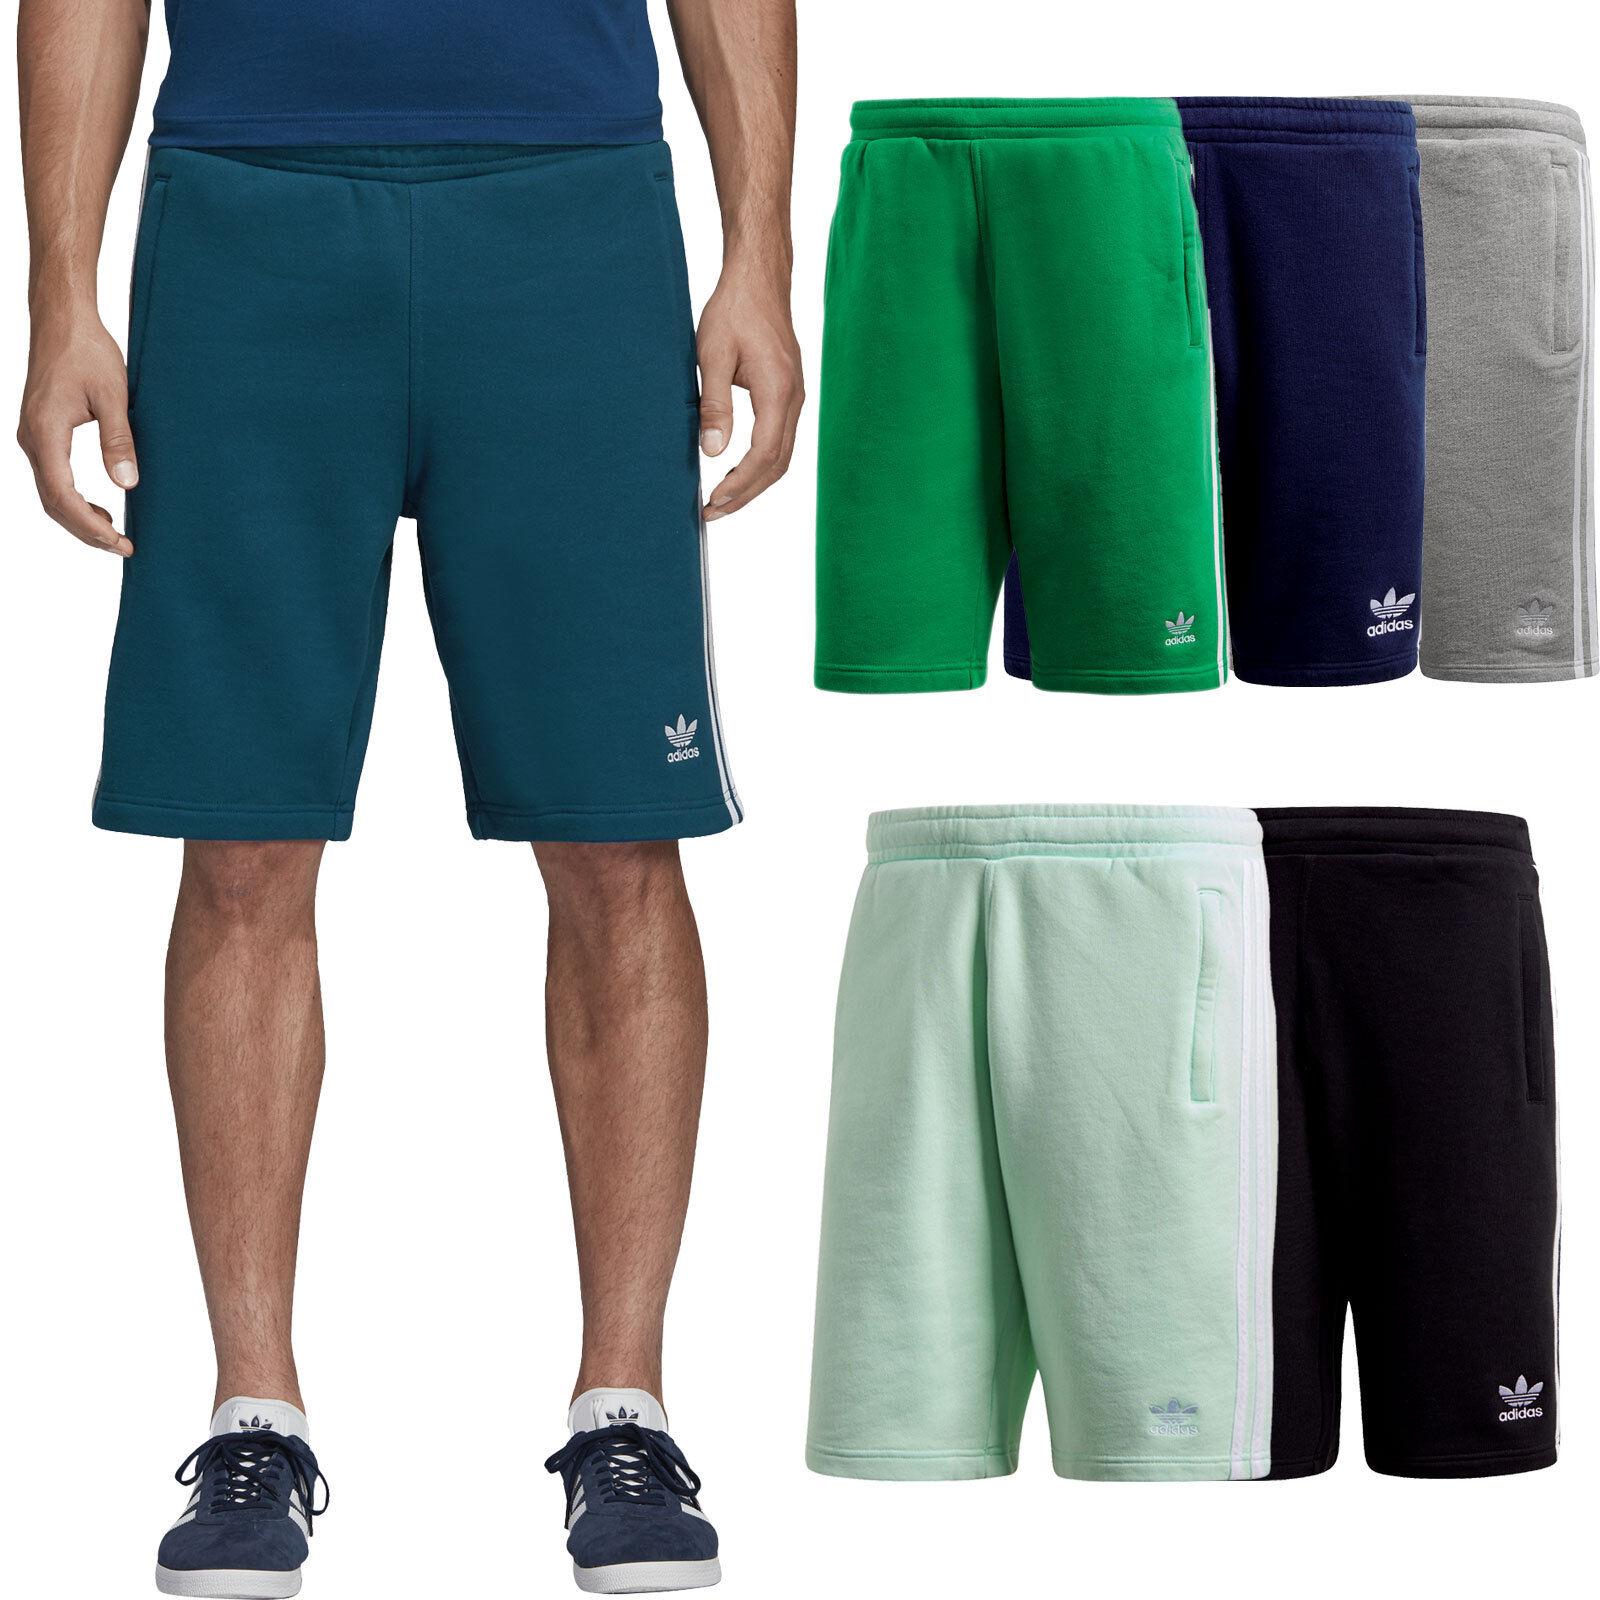 Adidas Originals 3-Stripe Shorts Men's Shorts Leisure Pant Bermuda Jogging Pants